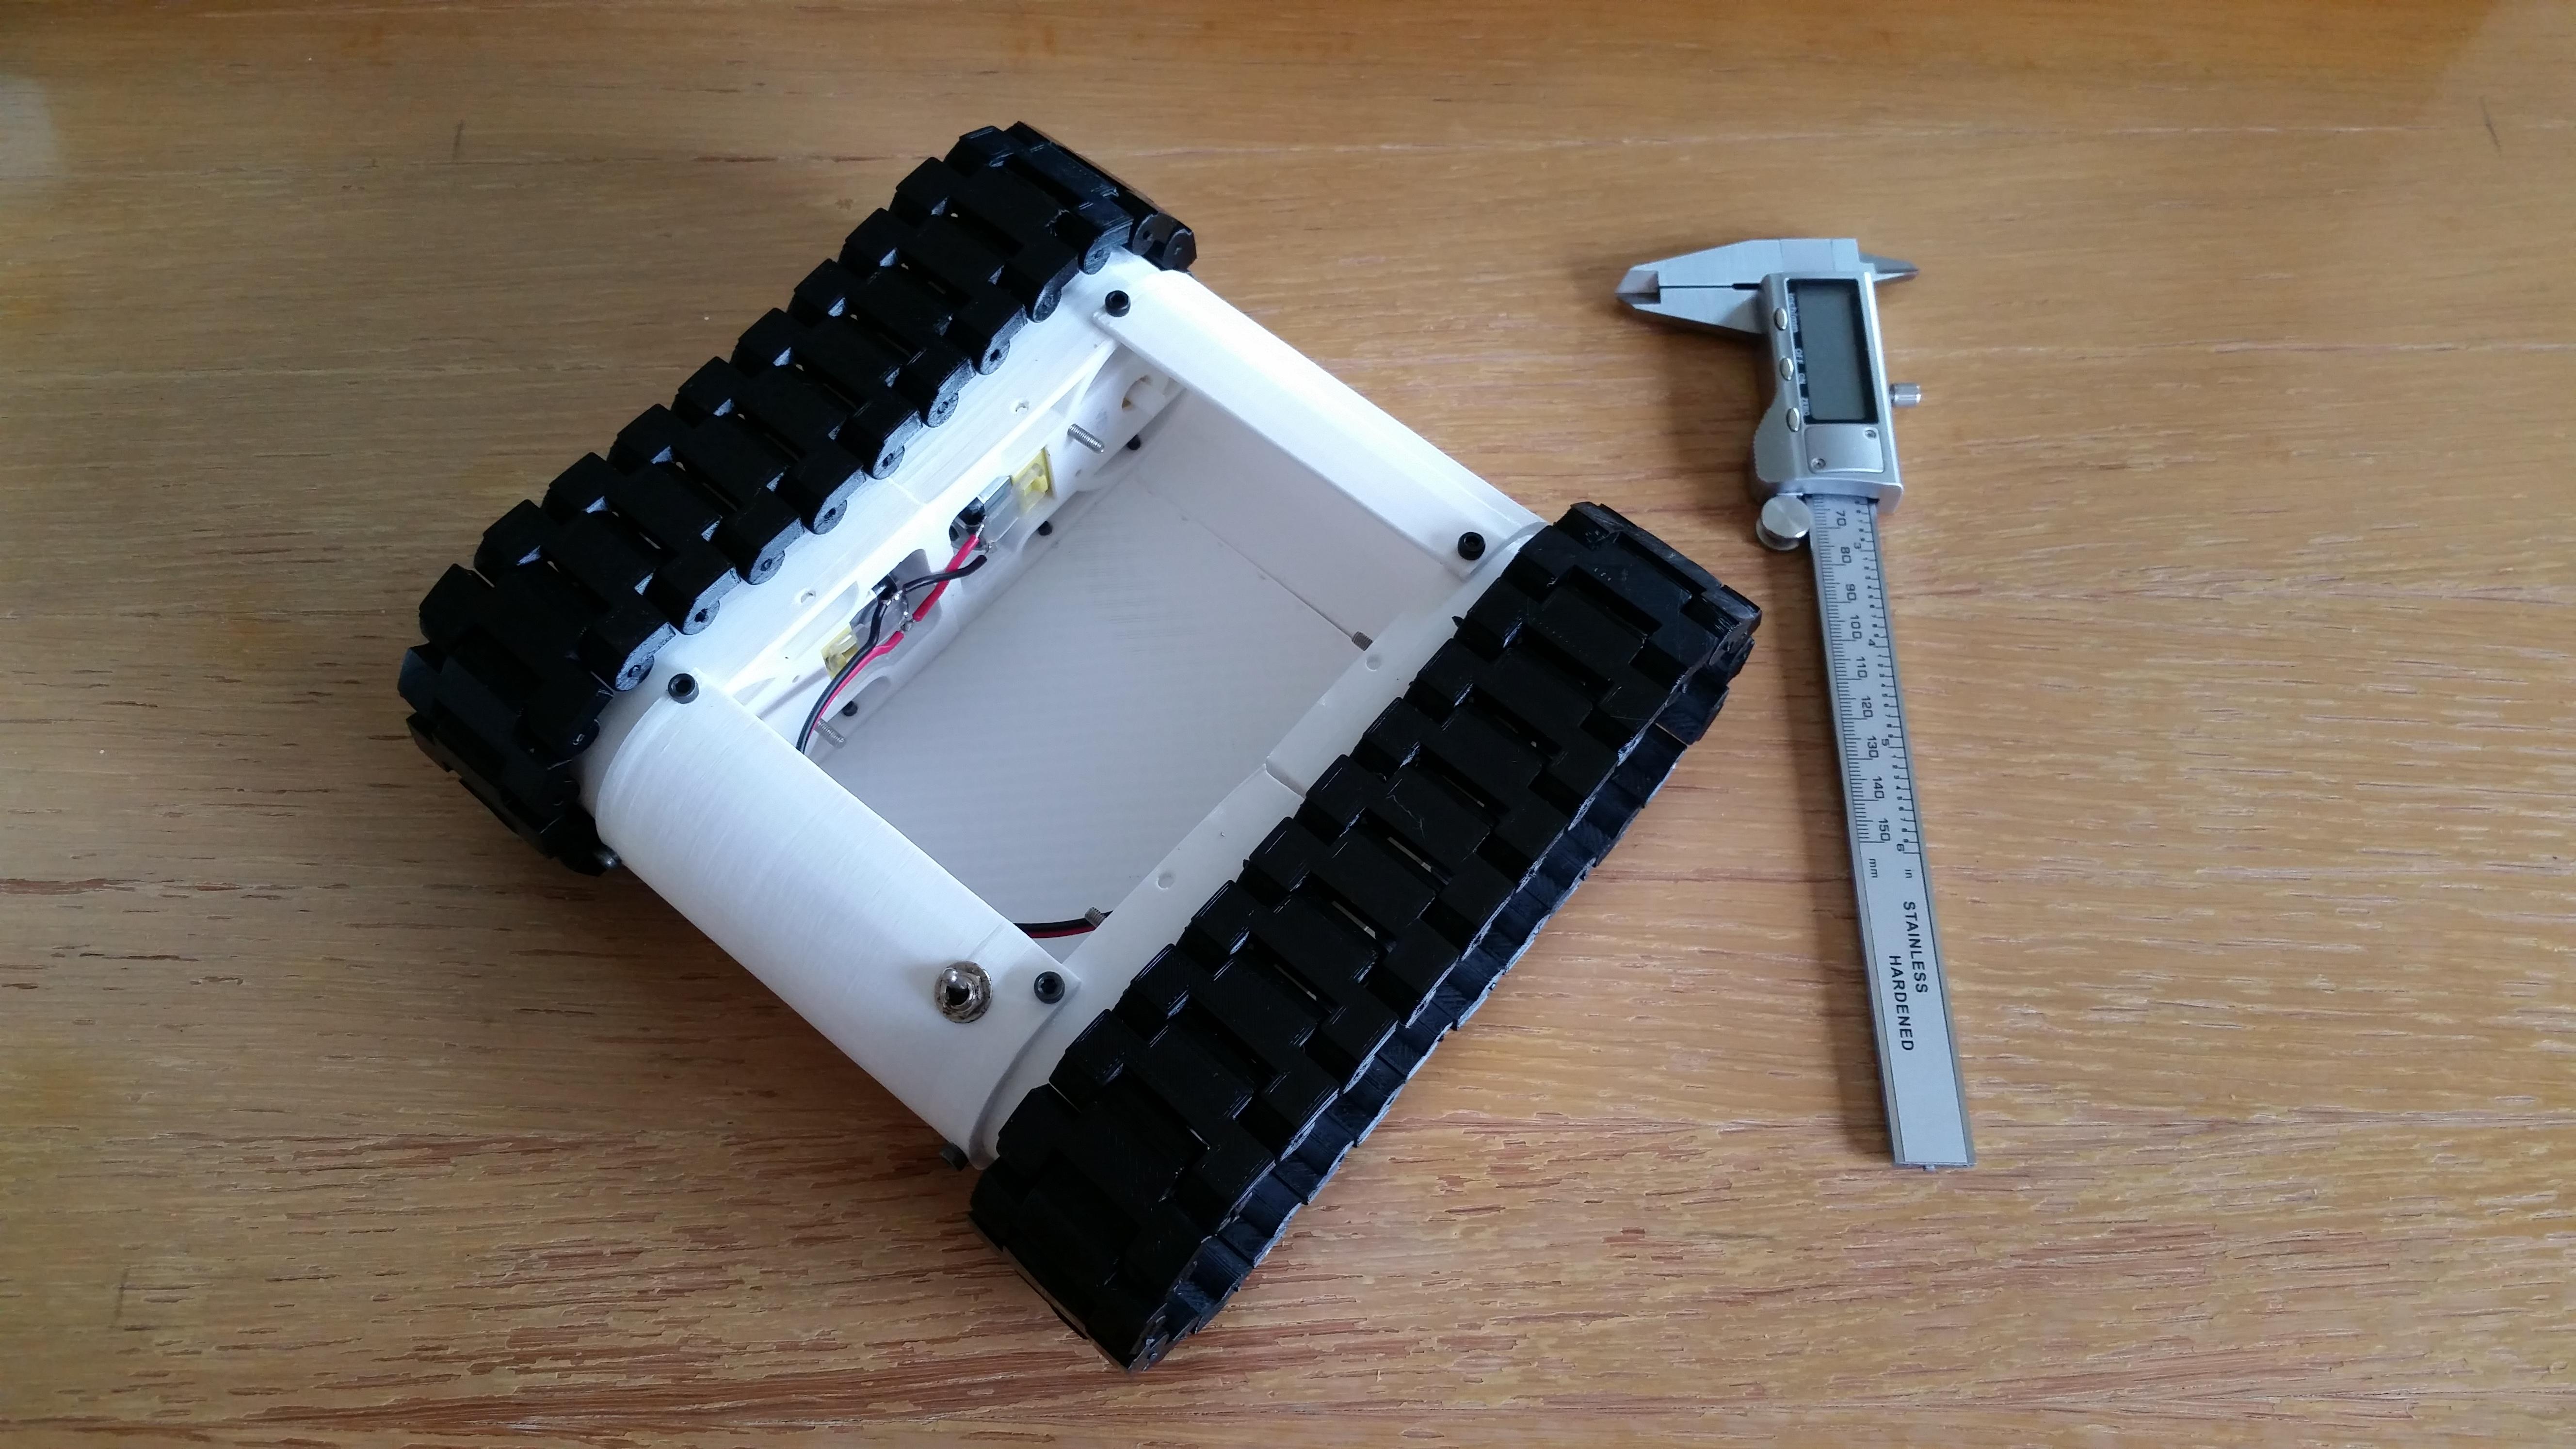 3D Printable Rover Platform